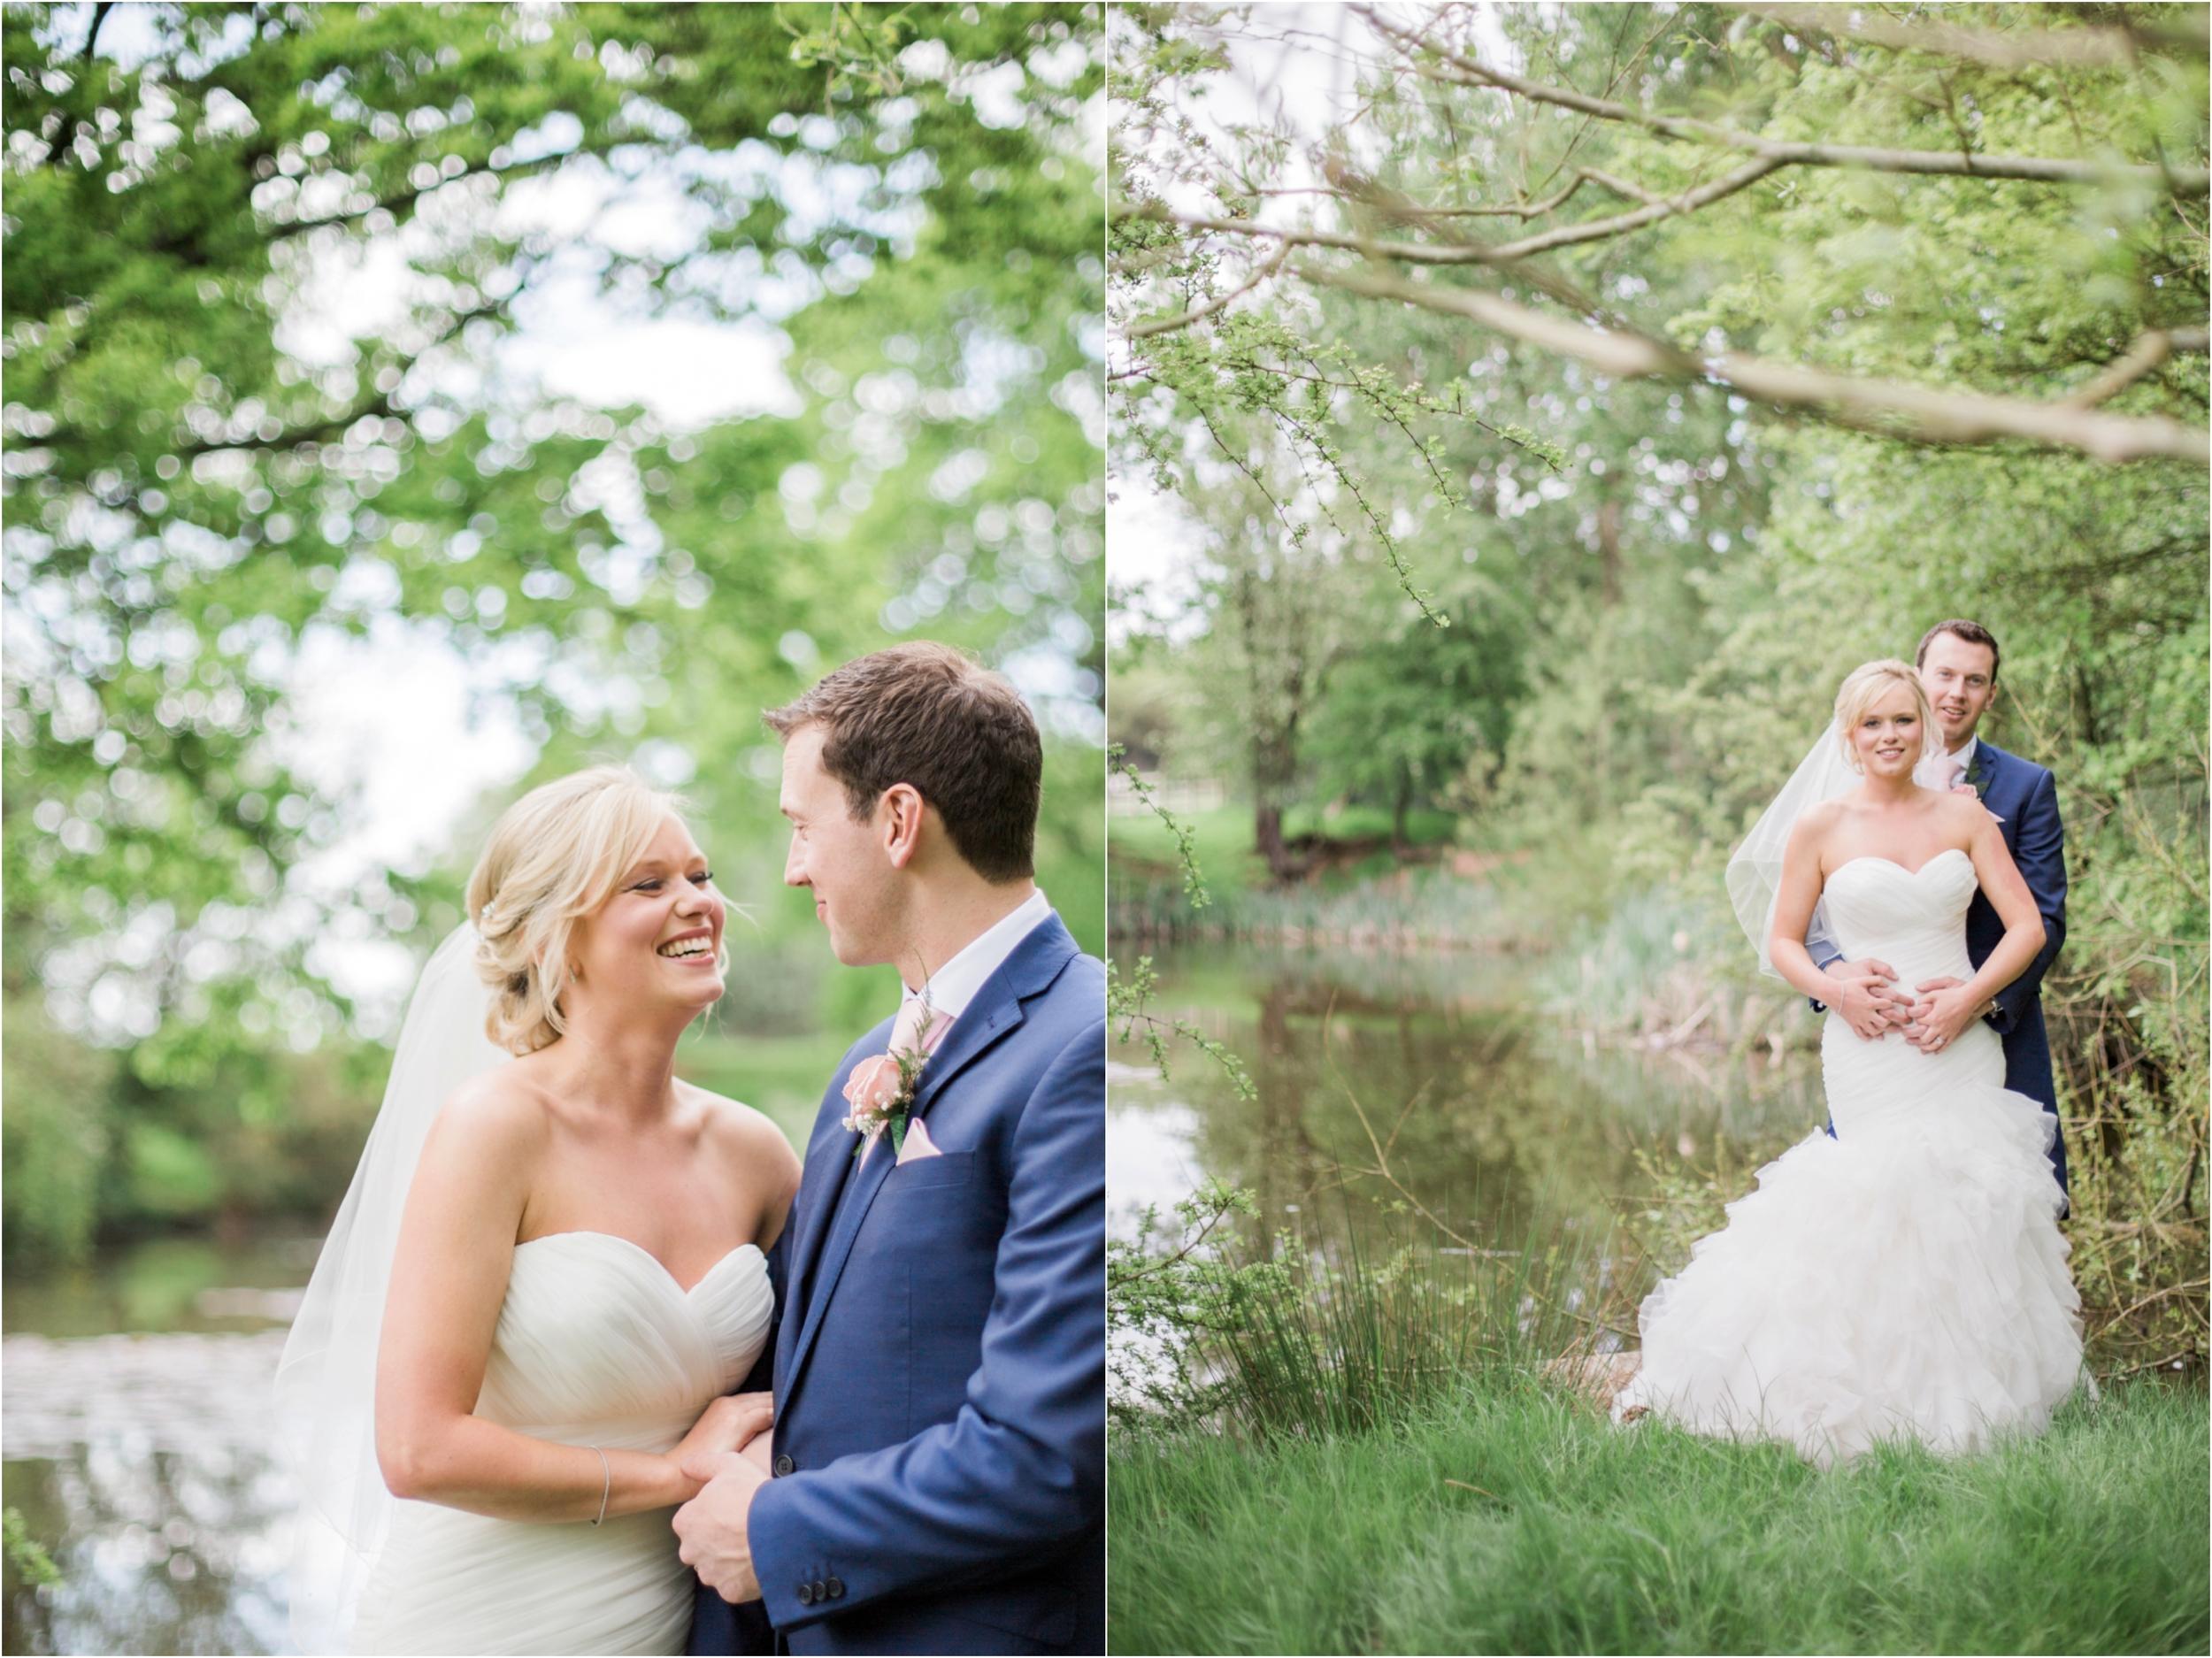 Sophie Evans Photography, GUs & Emma Farm Wedding, Warwick boys school wedding, Warwickshire wedding photographer-3.jpg